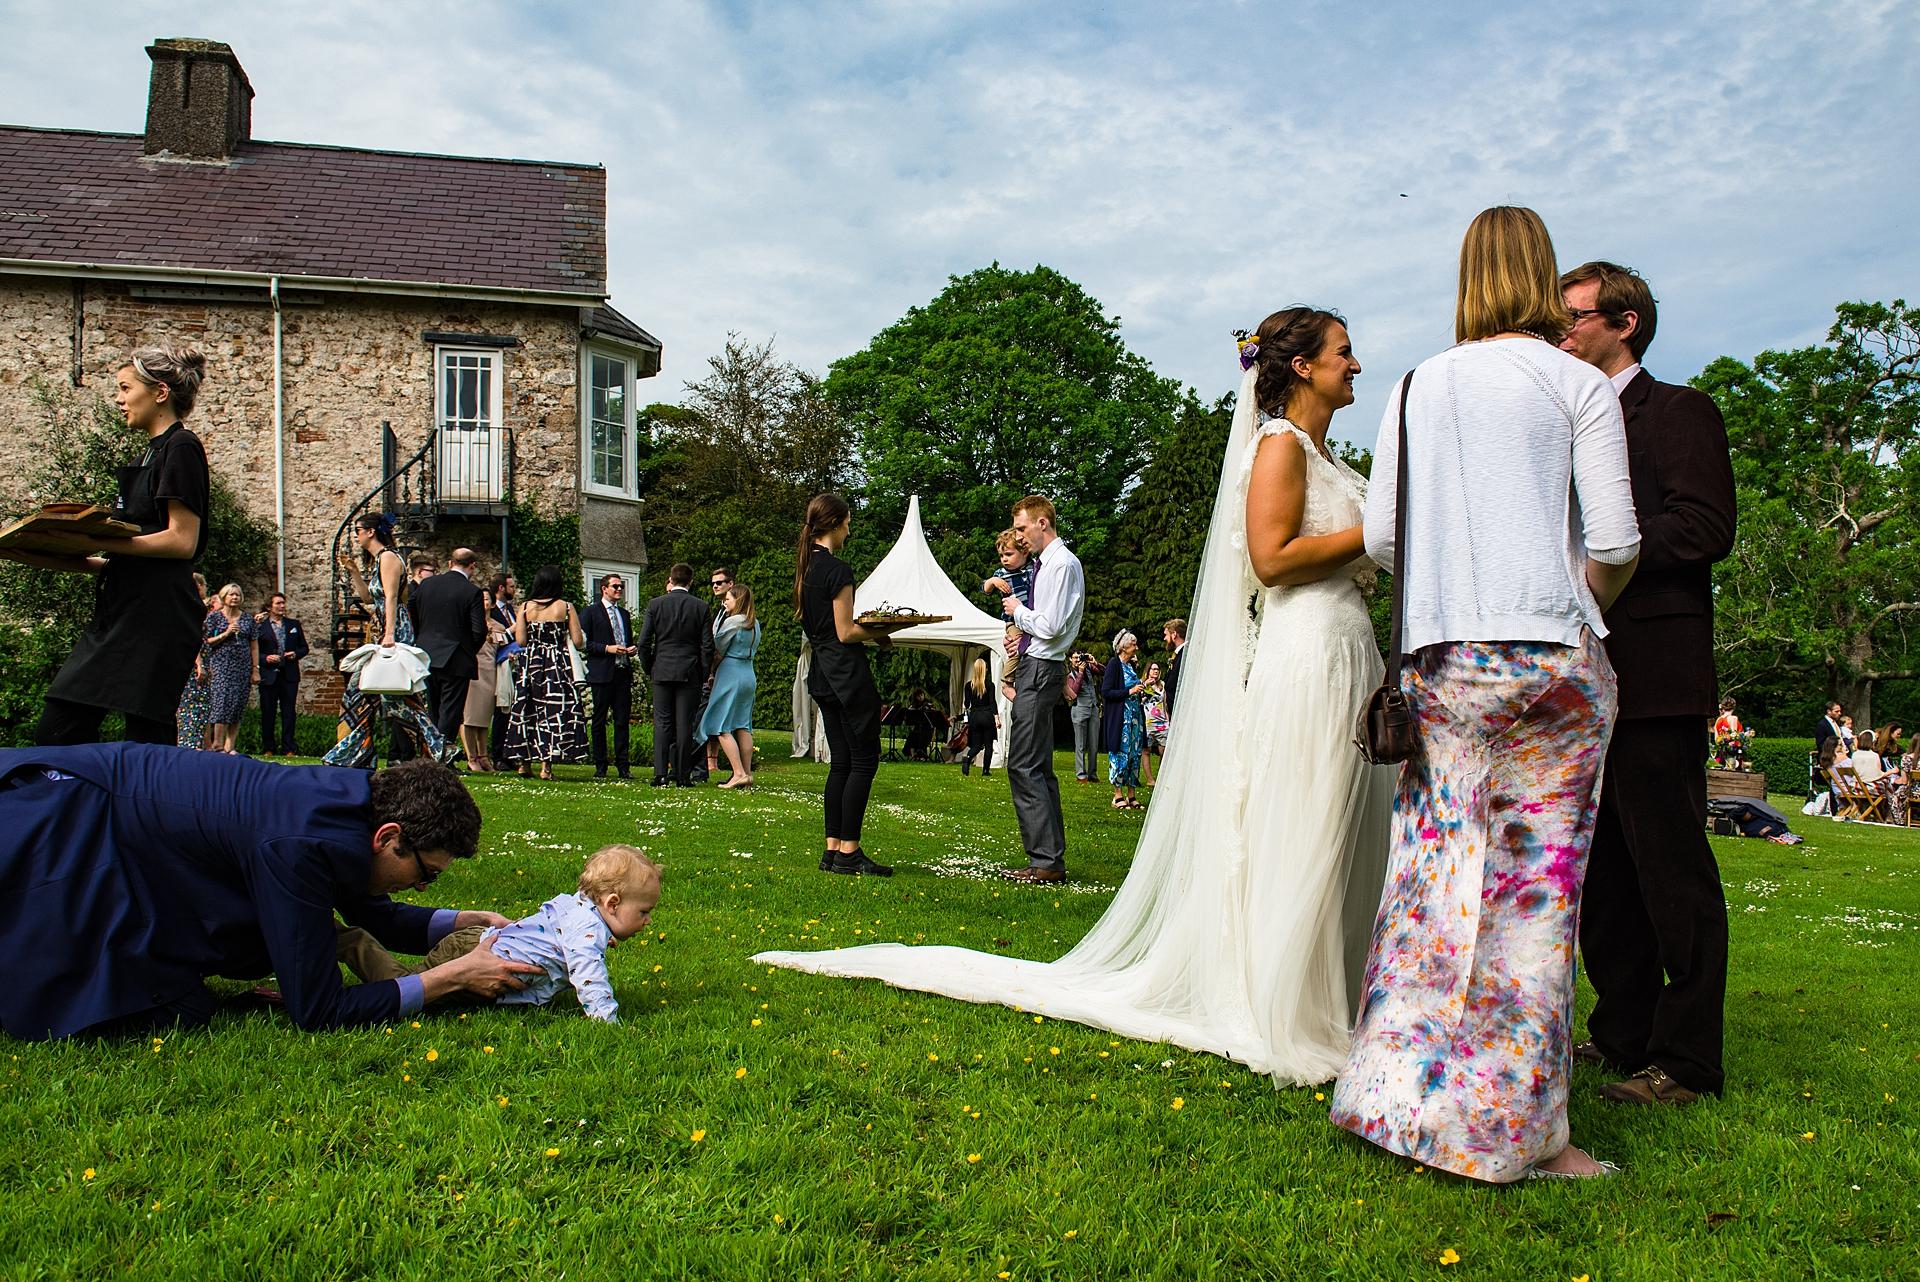 Jonny Barratt, del Gloucestershire, è un fotografo di matrimoni per Penmaen House, Galles